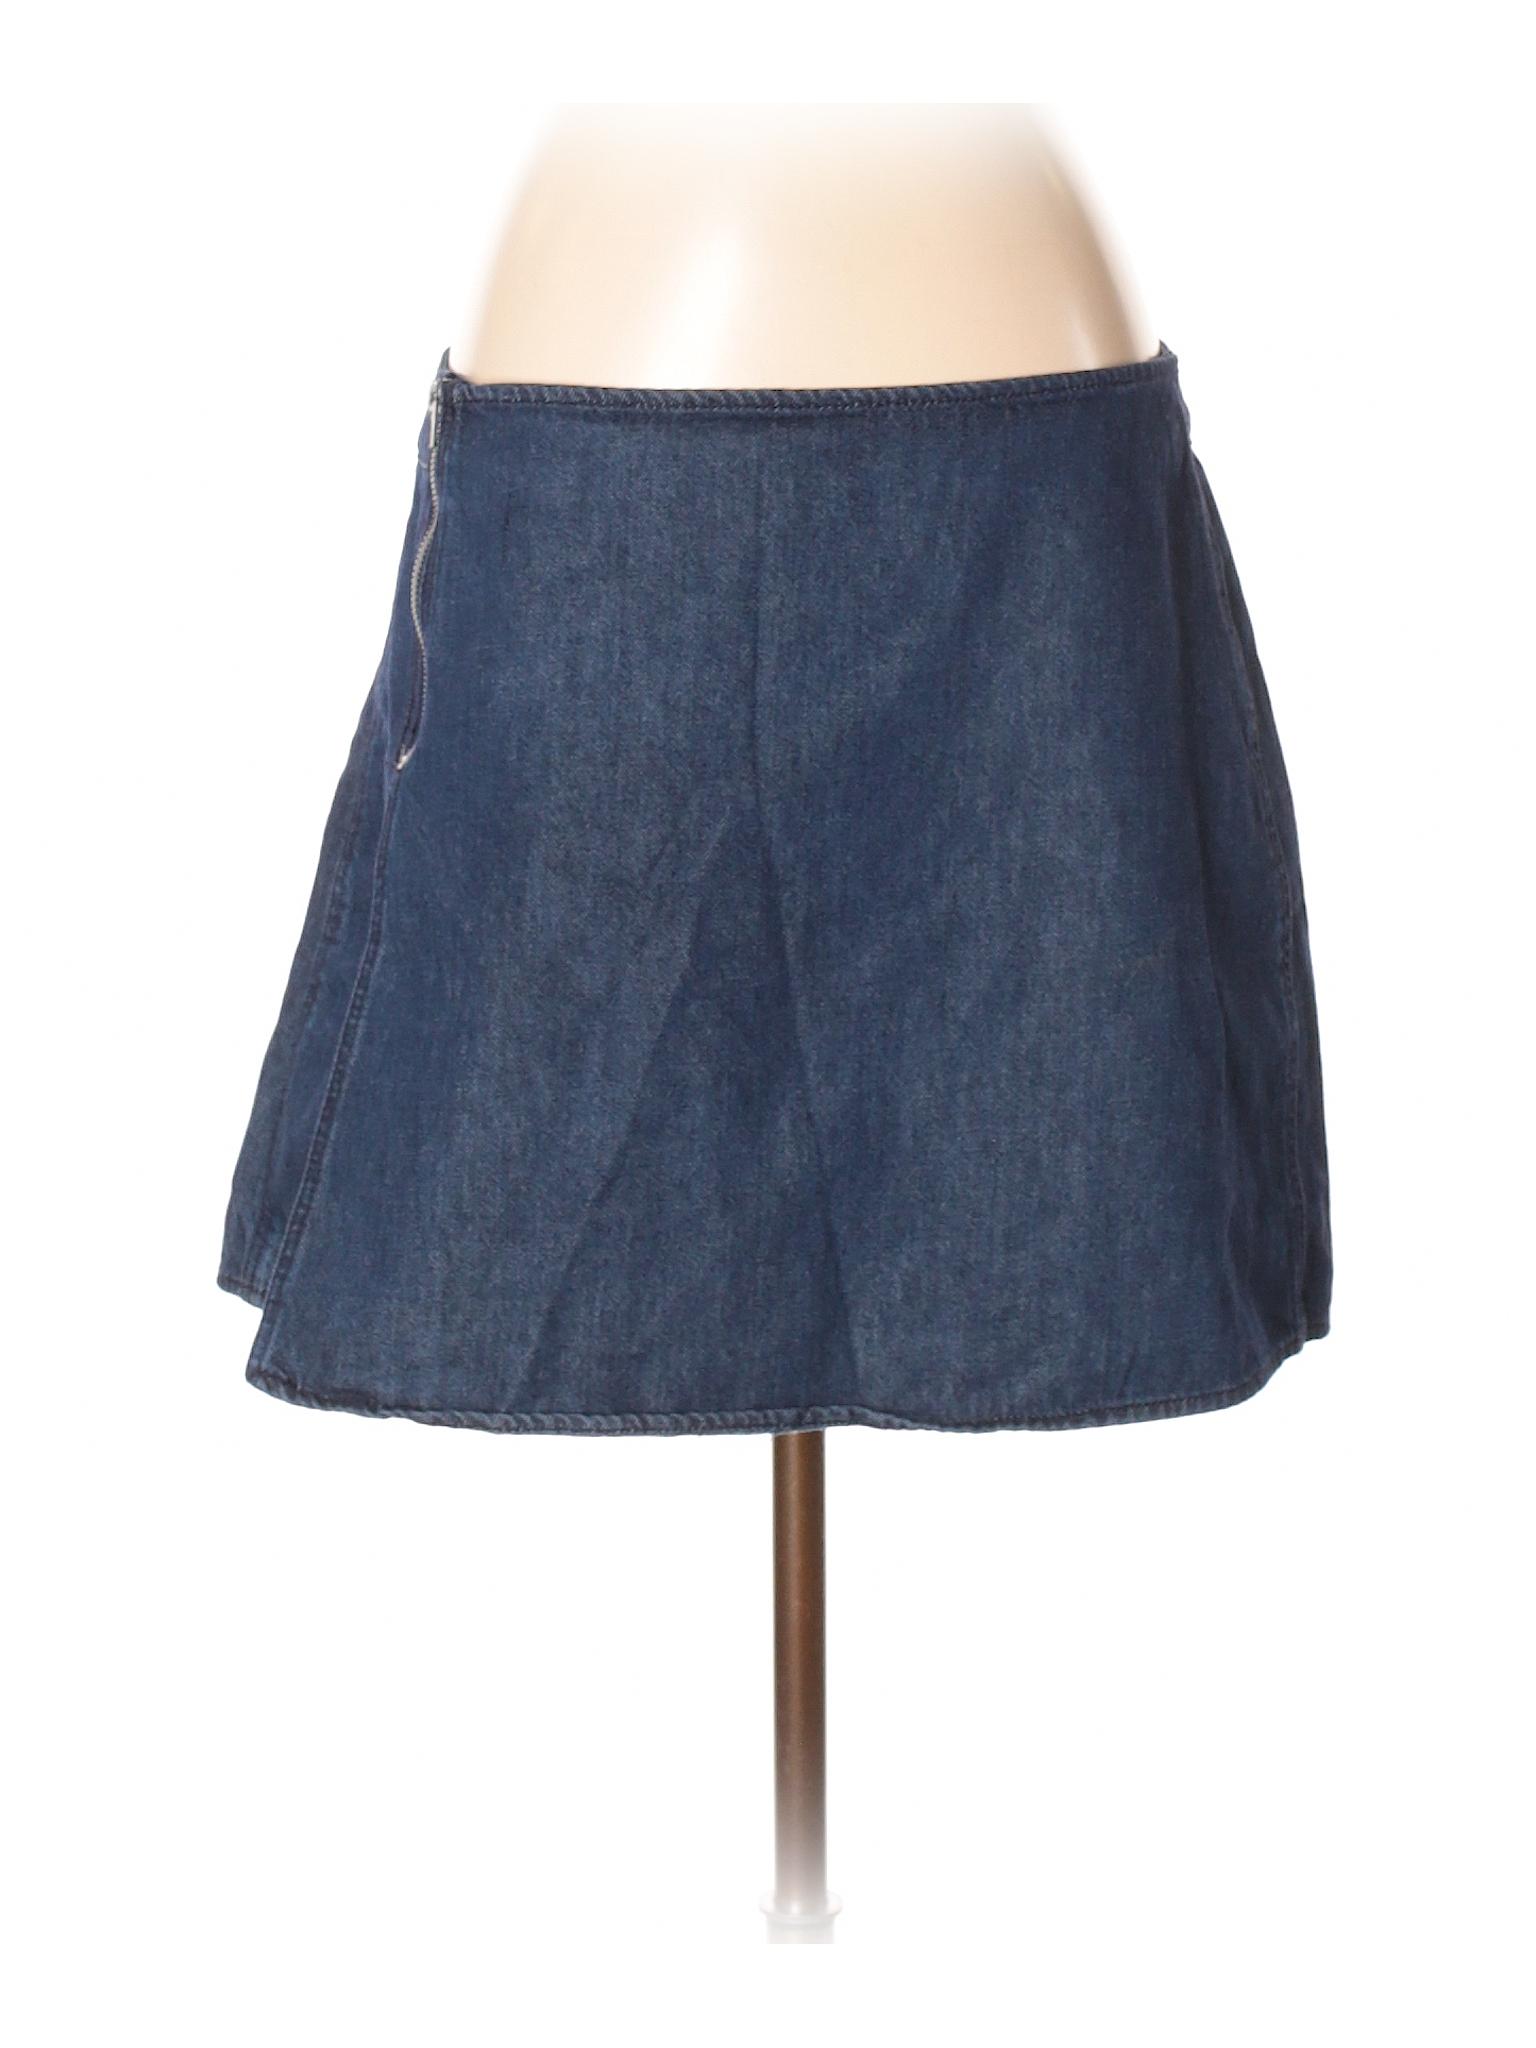 Zara Leisure Denim Winter Skirt Skirt Winter Leisure Zara Denim Leisure Winter OqBaqx